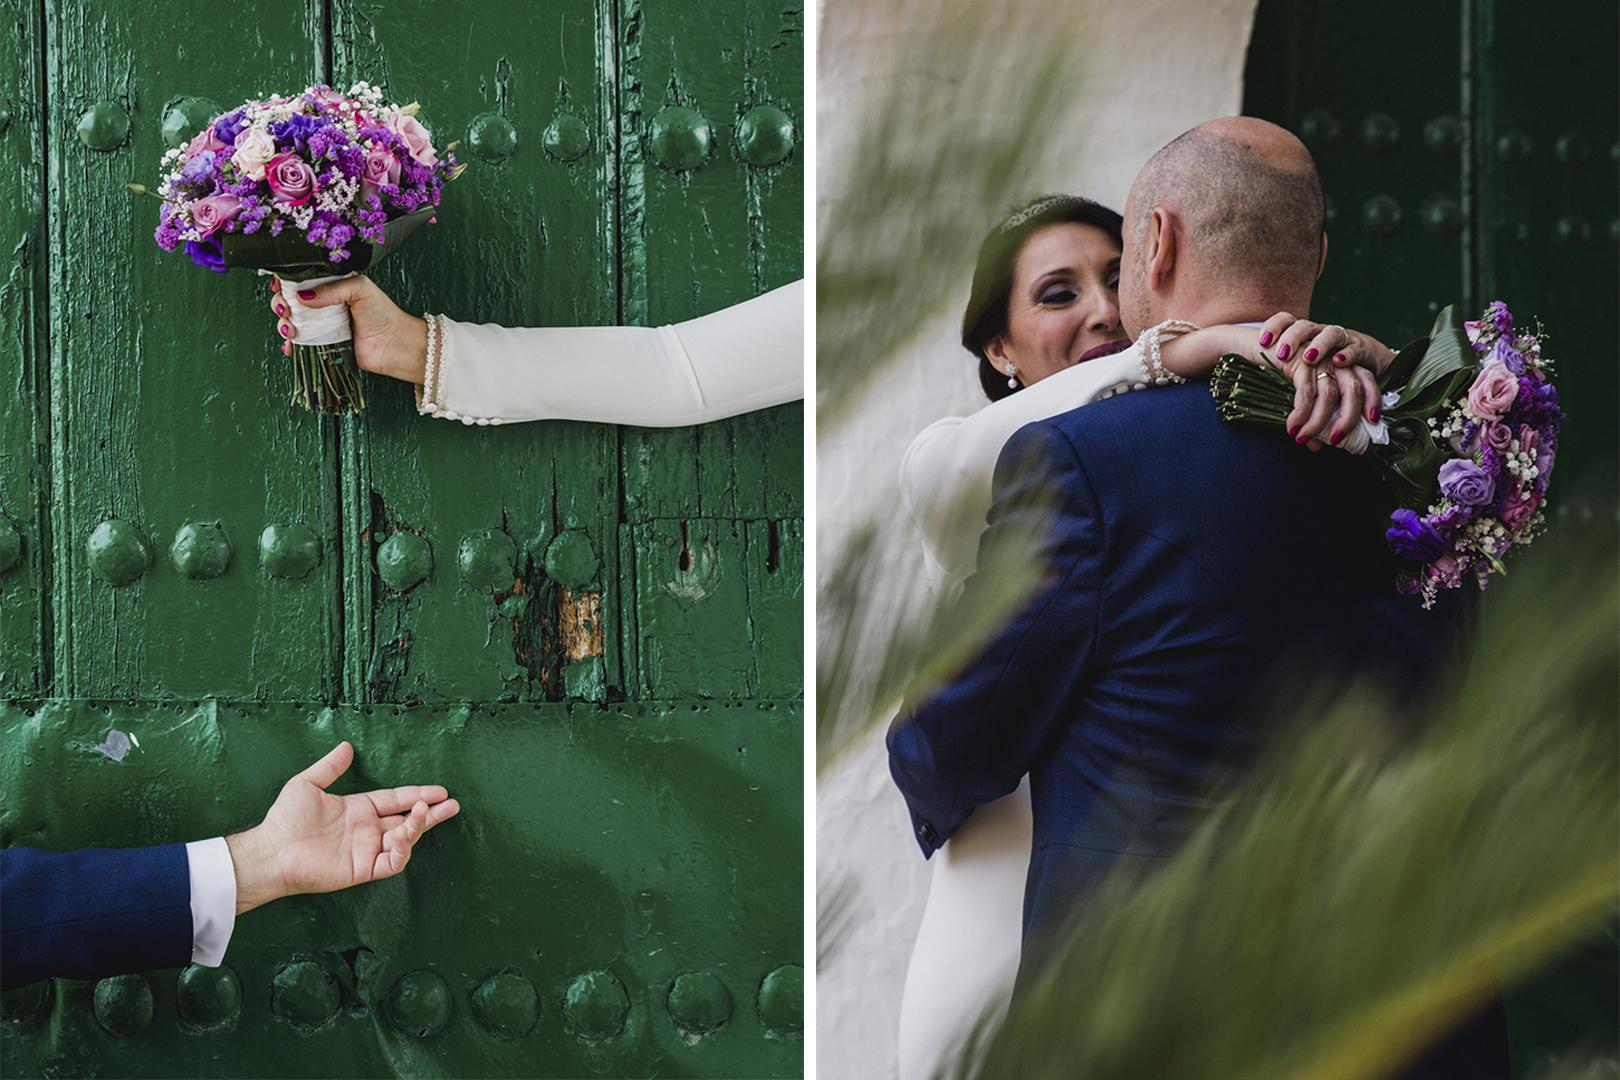 2-boda hacienda torre doña maria. carlos pavon fotografia. 600257783-47.jpg